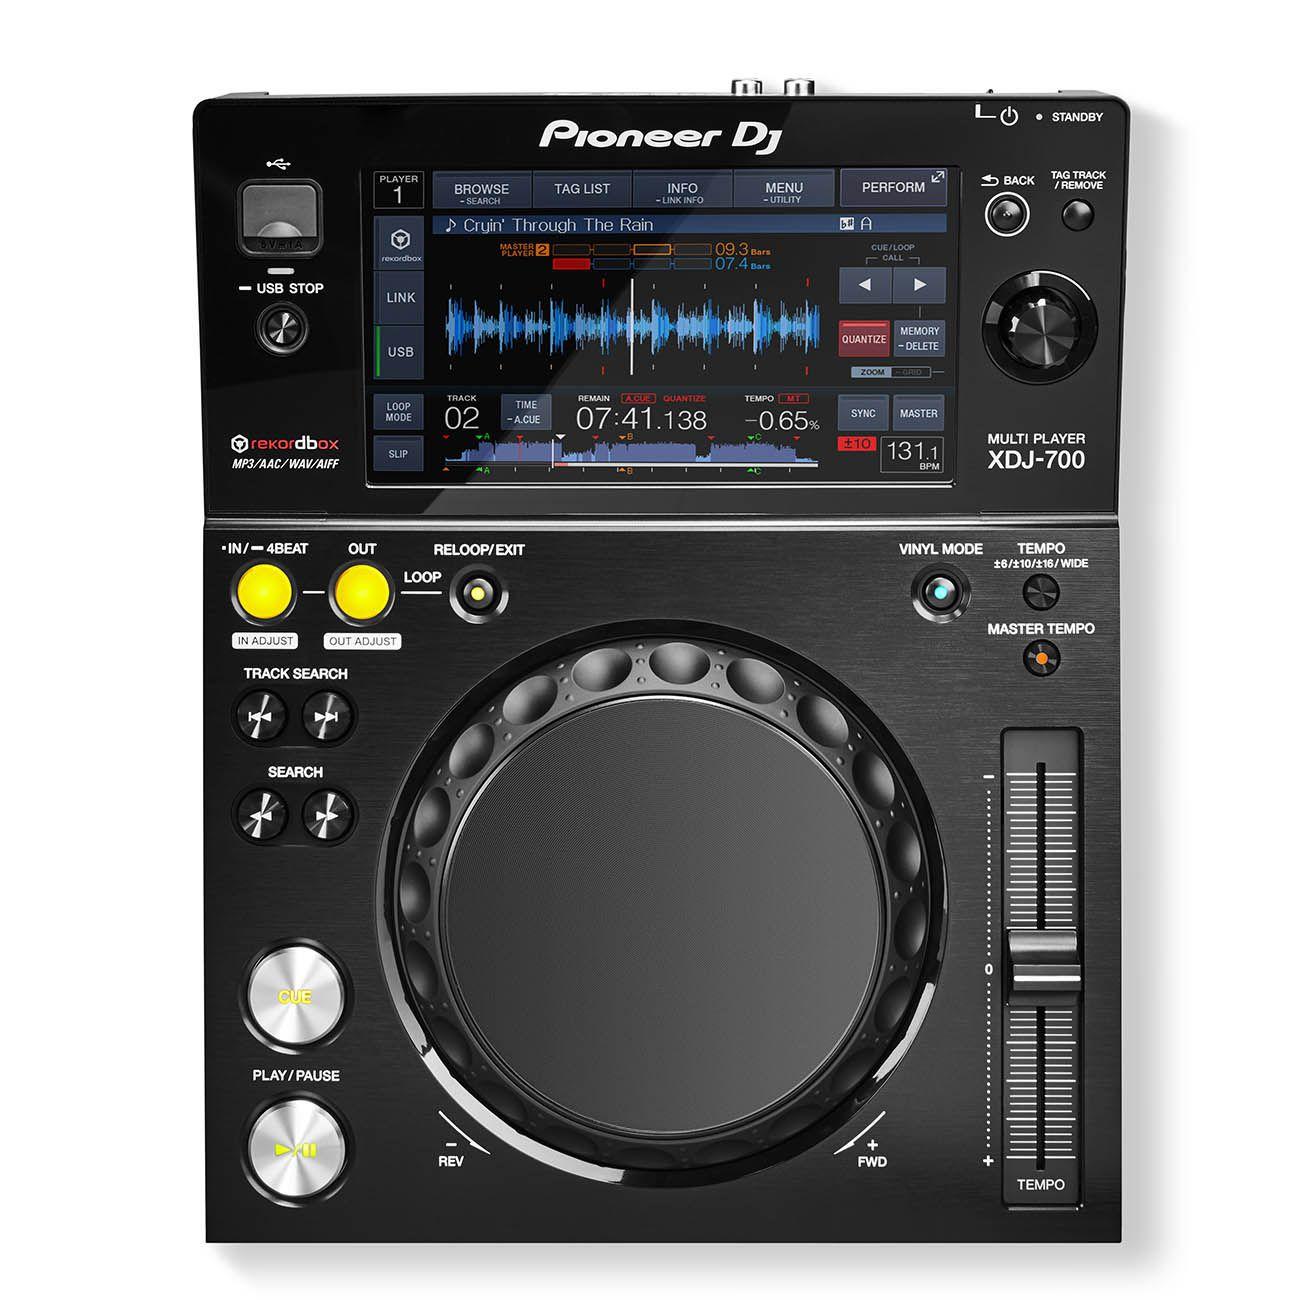 Controladora Pioneer DJ XDJ 700